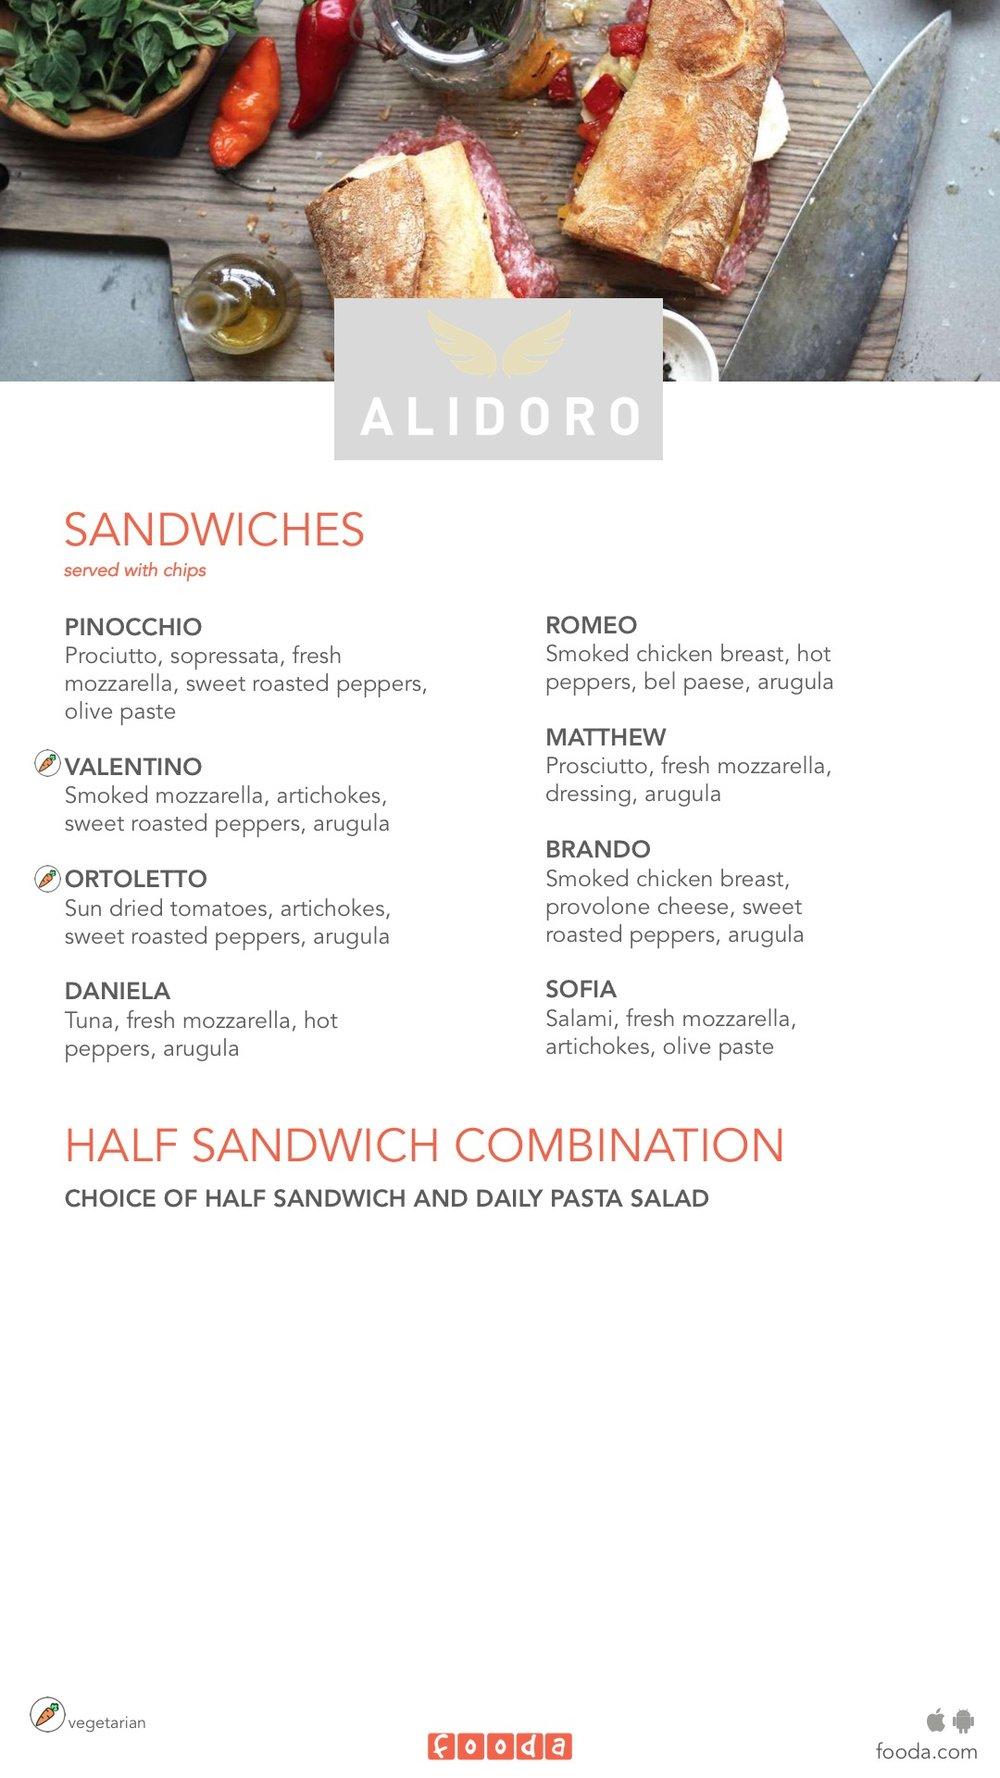 PPP Alidoro 9.5.17 (2).jpg